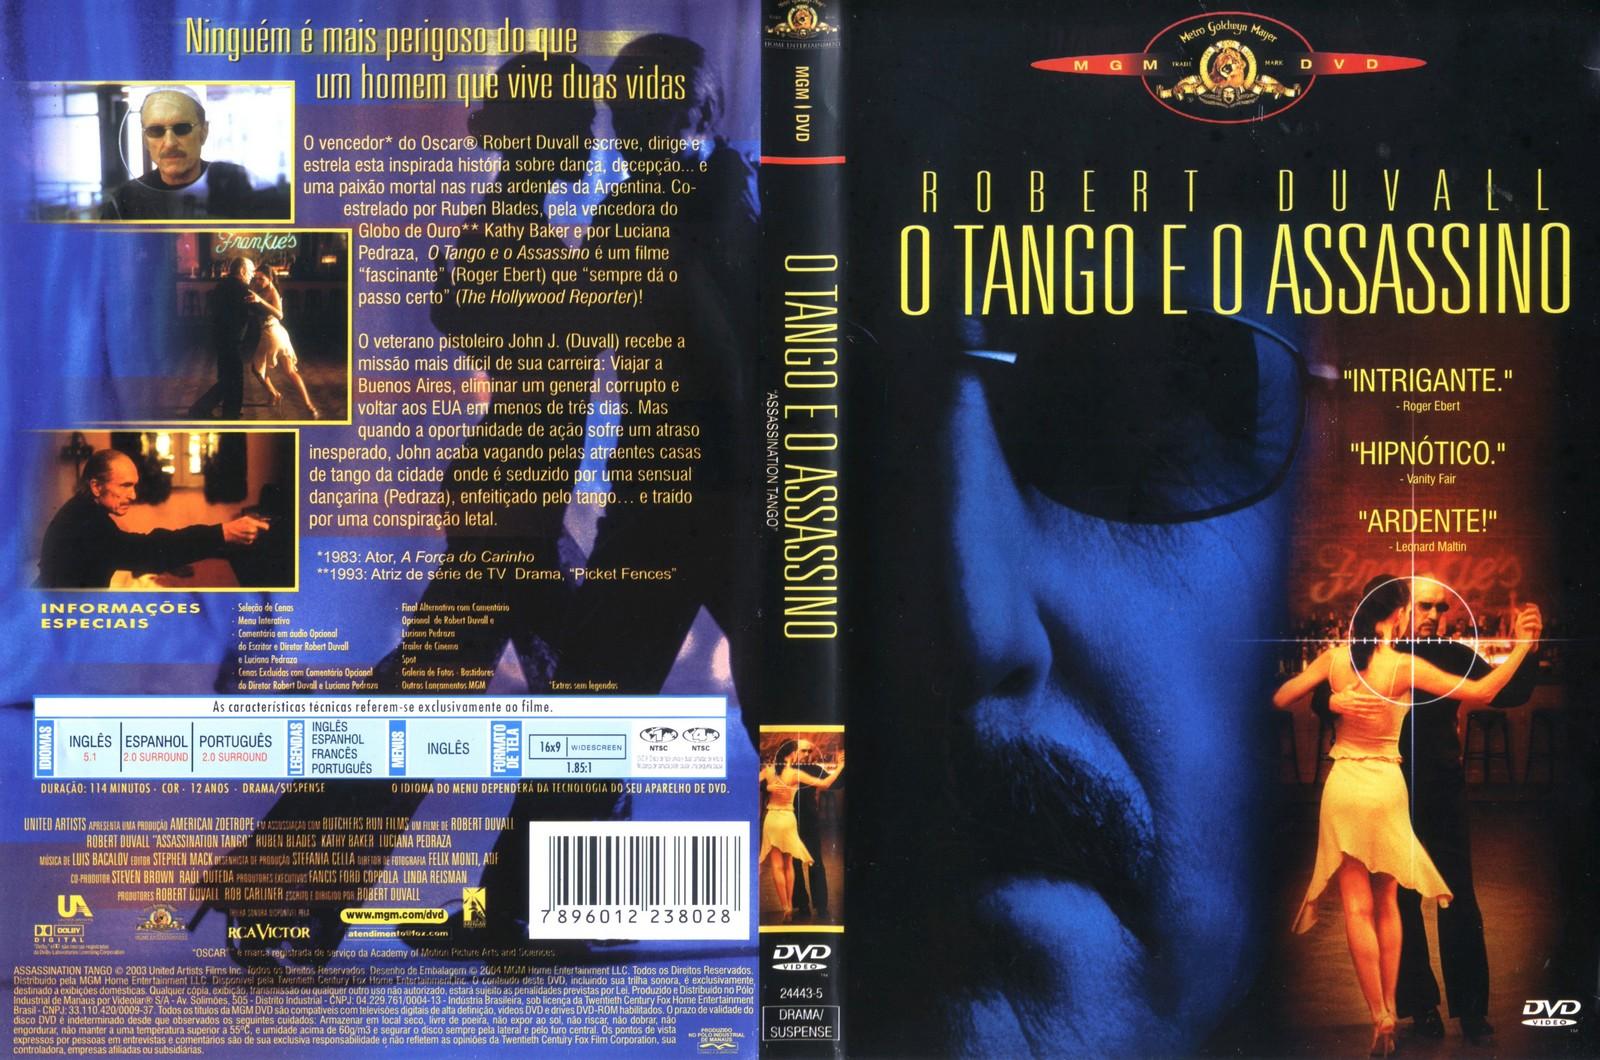 http://2.bp.blogspot.com/-FDRxaN_XKCo/Tf9CSFcIDVI/AAAAAAAAA1s/w6kct8A99ZQ/s1600/O-Tango-E-O-Assassino.jpg